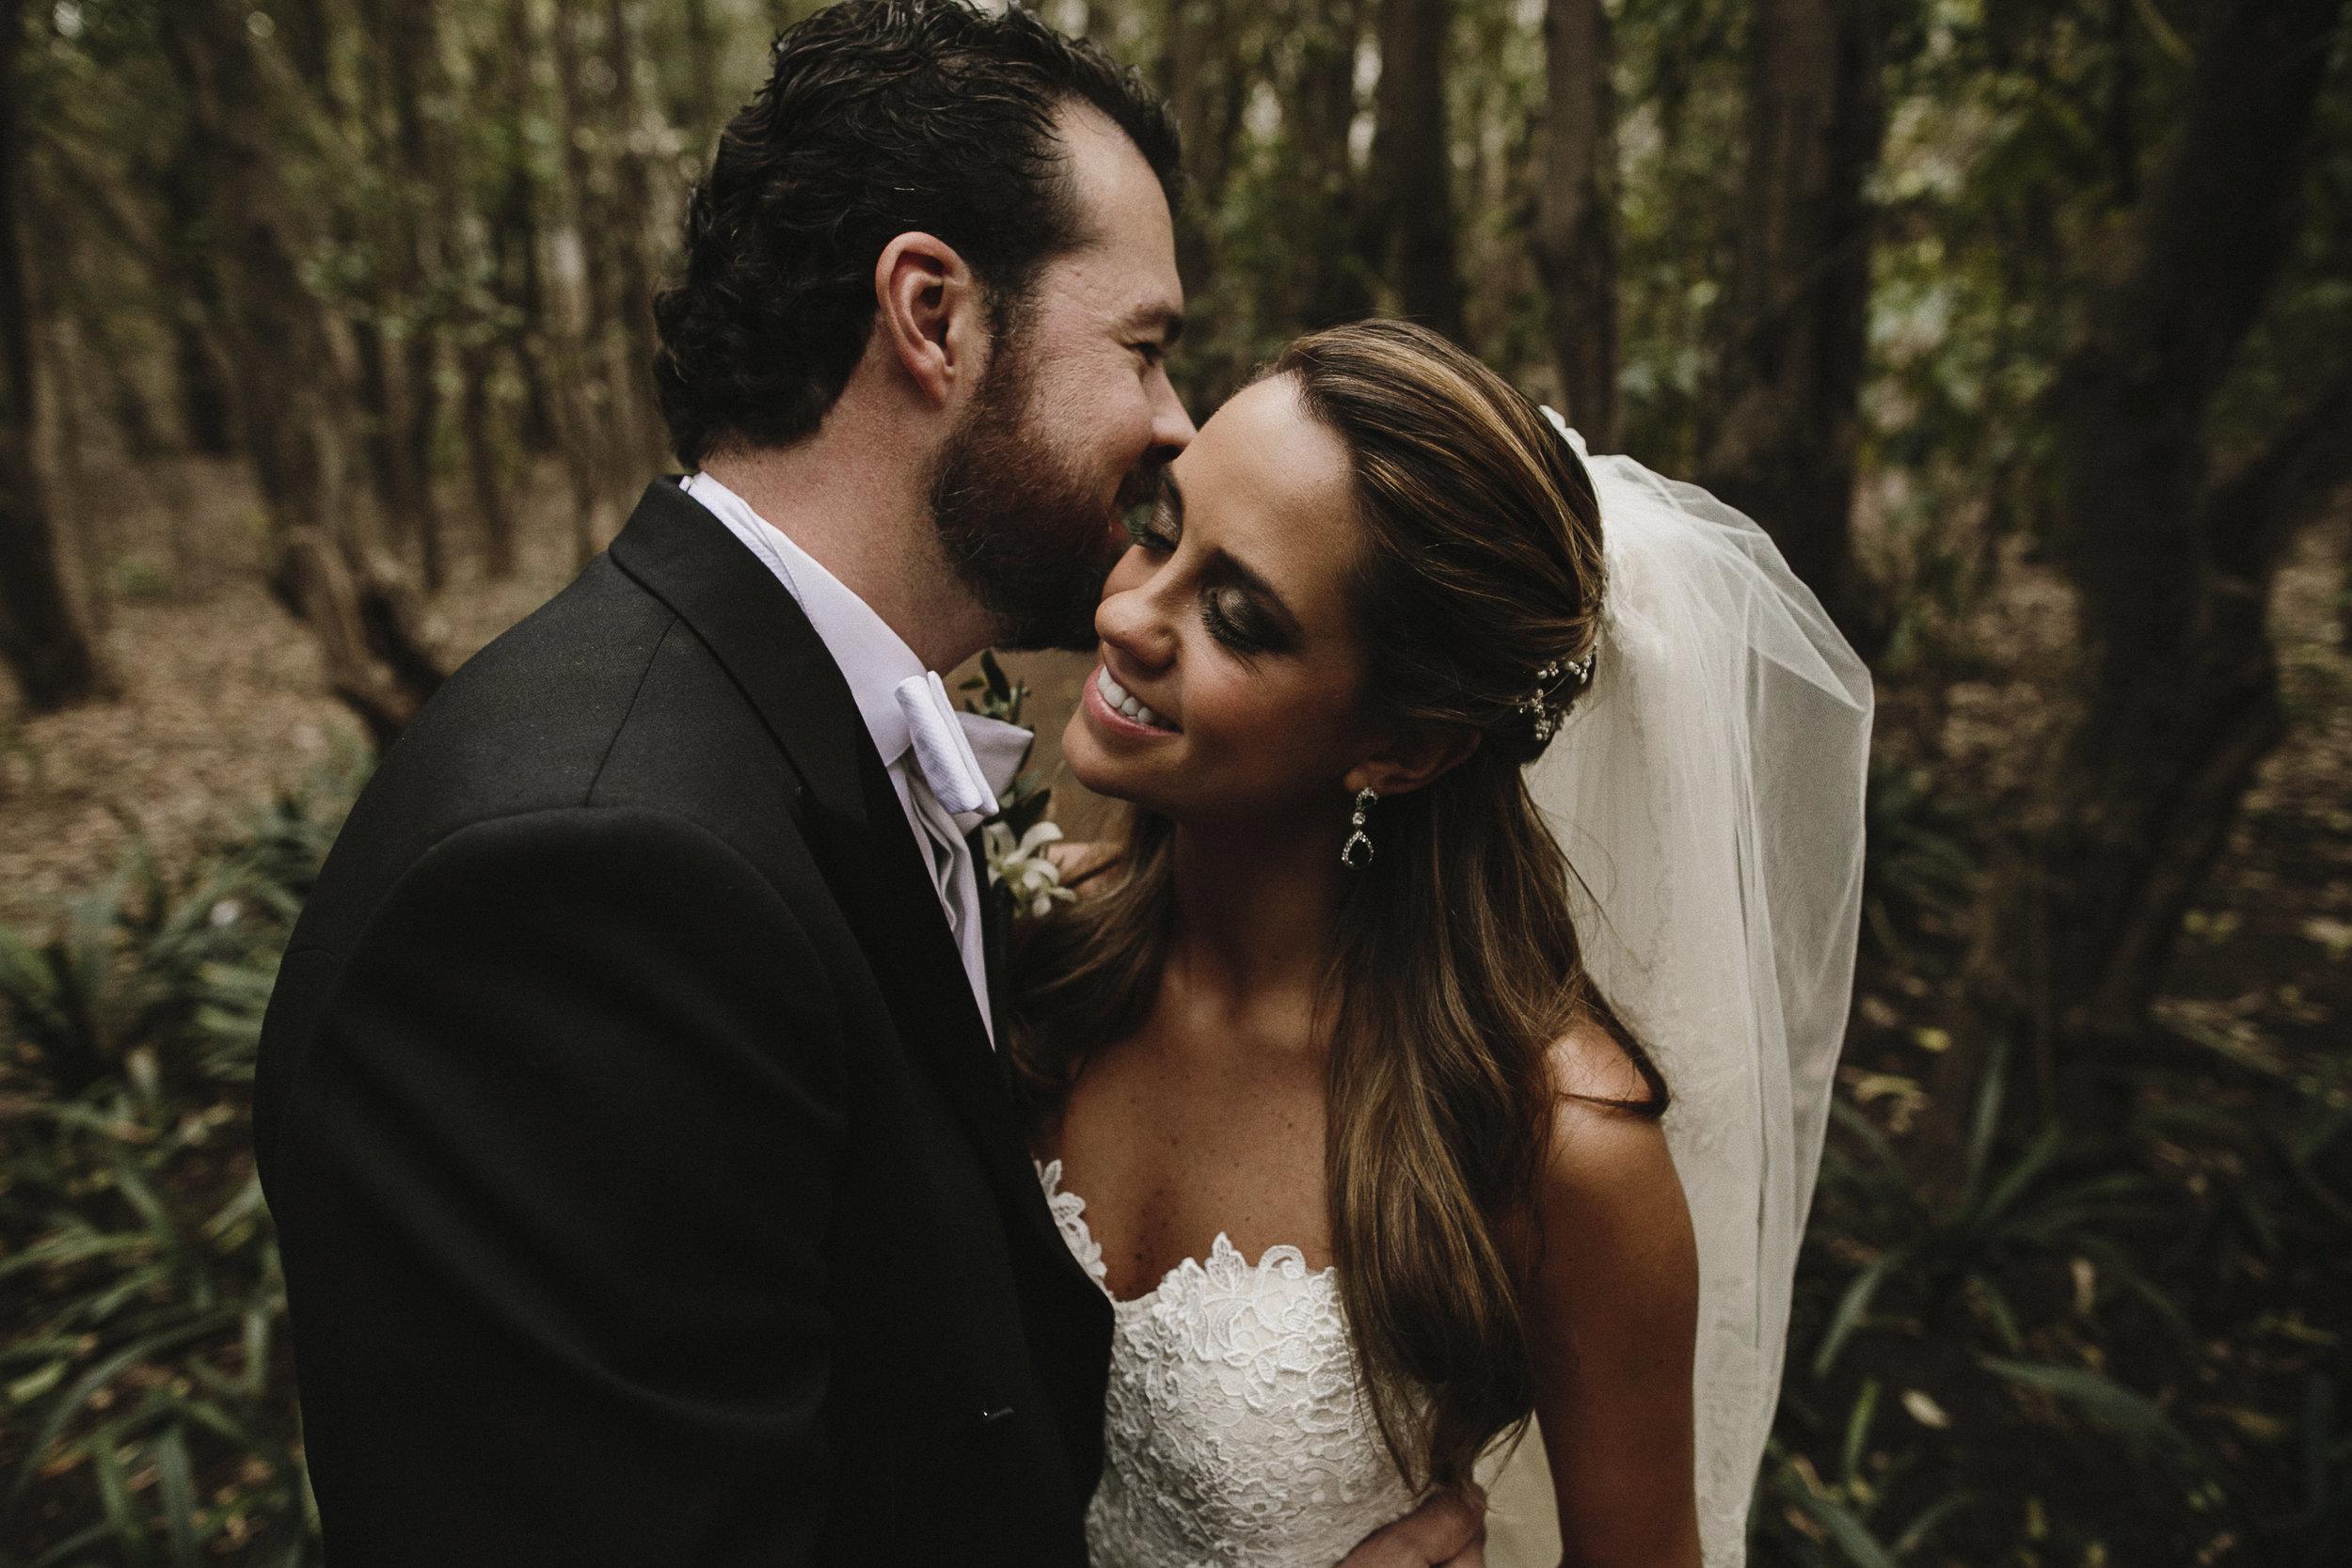 alfonso_flores_destination_wedding_photogrpahy_paola_alonso-235.JPG